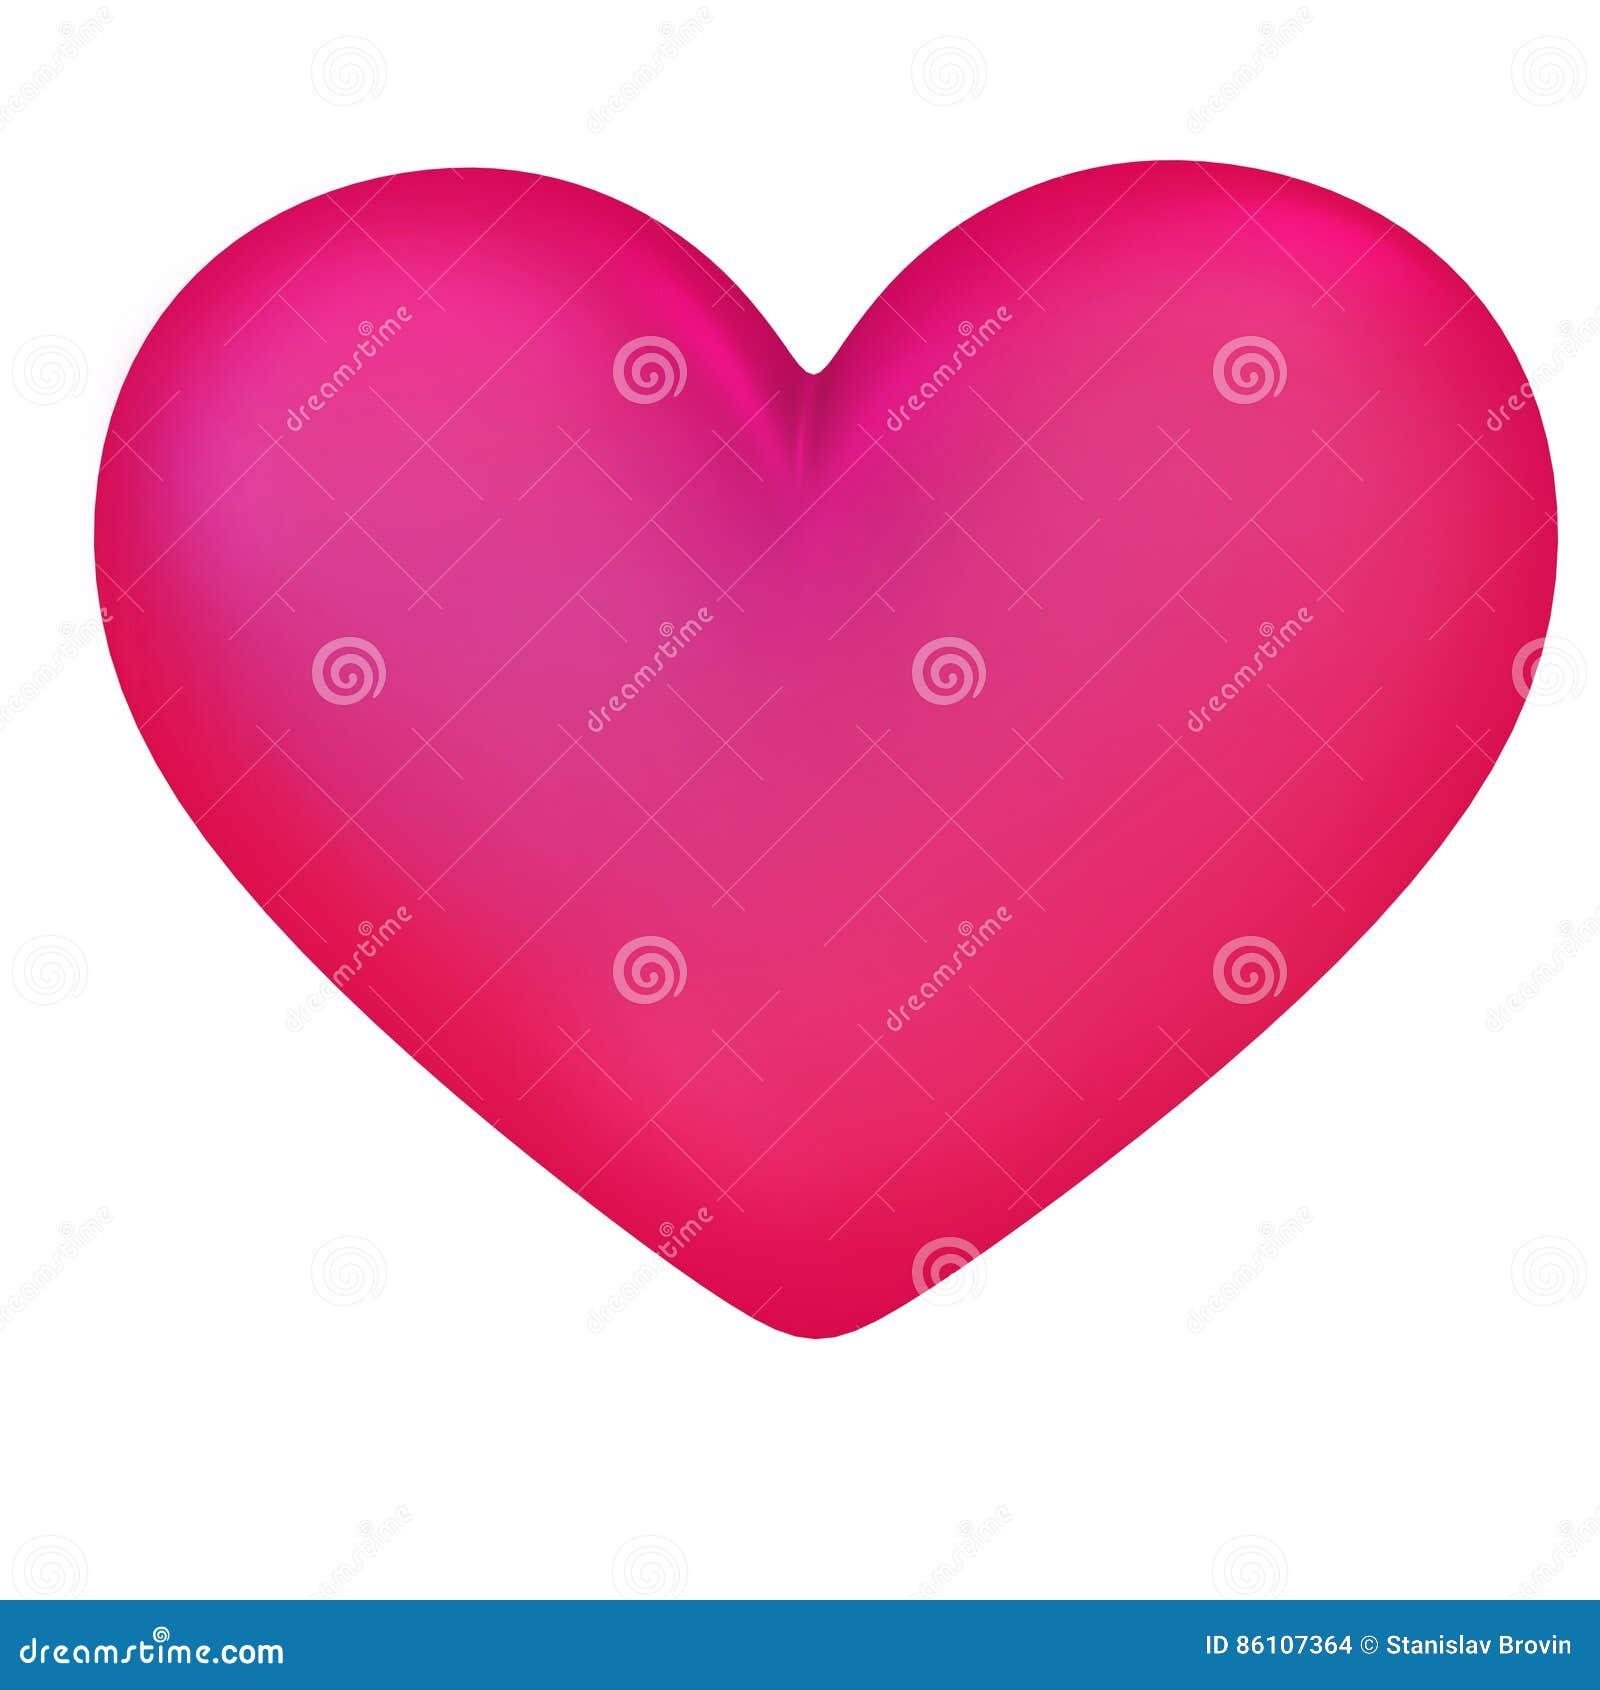 Purple heart symbol on a white background stock illustration purple heart symbol on a white background buycottarizona